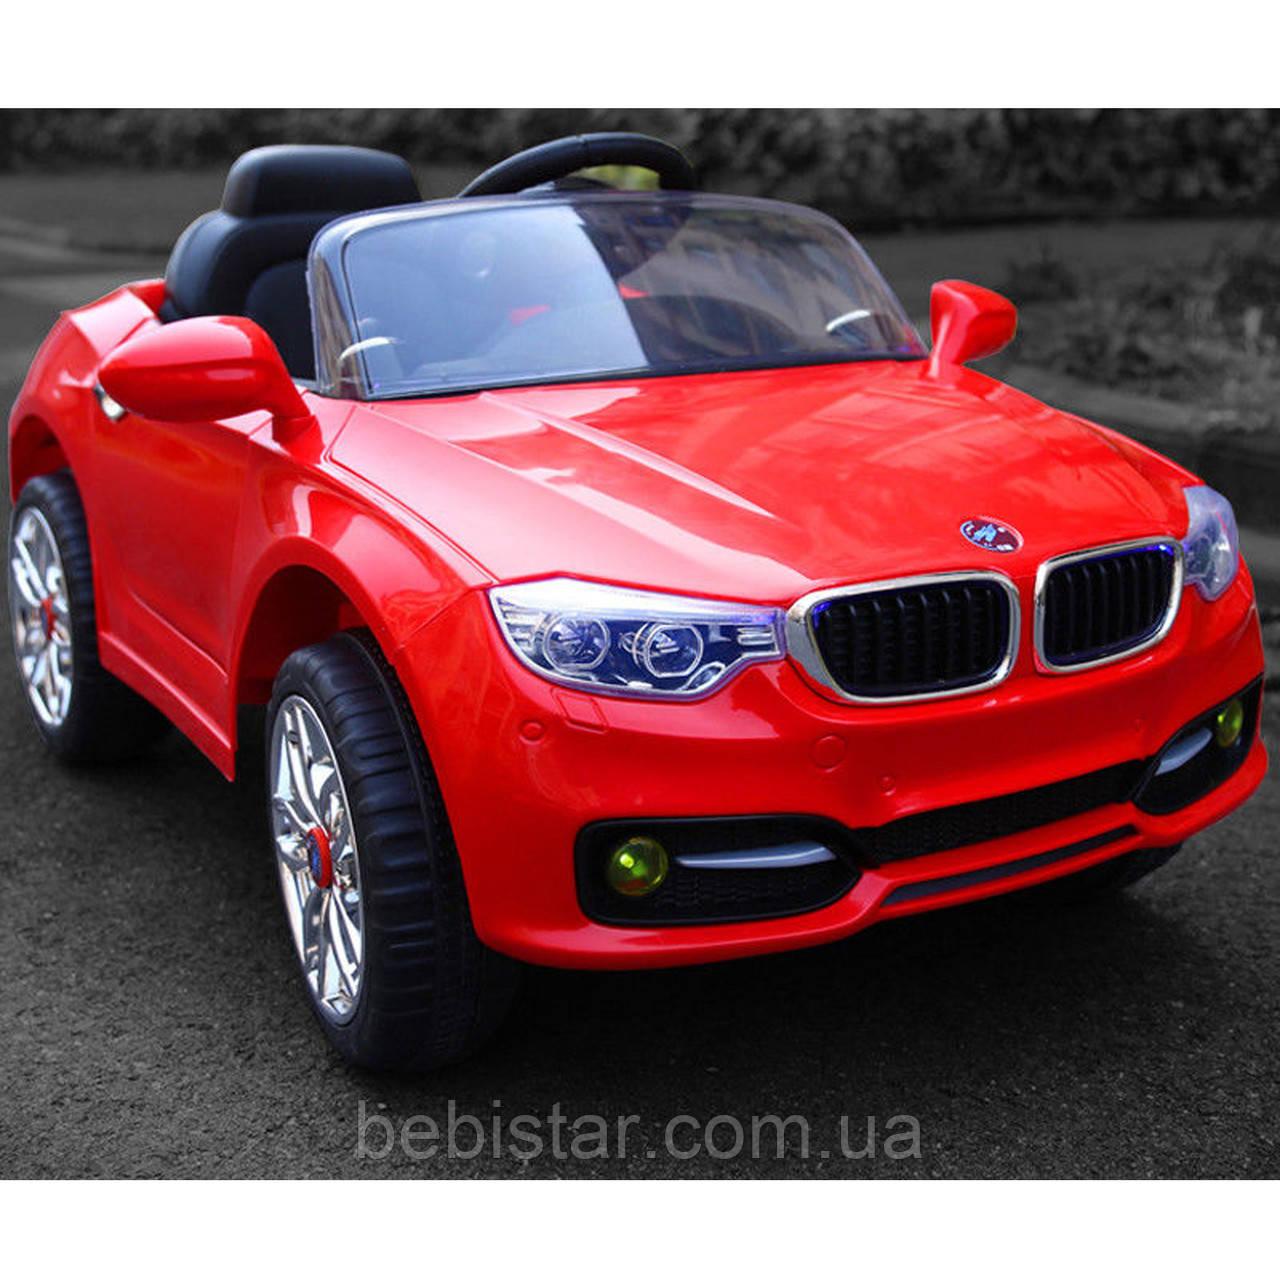 Электромобиль спортивный T-7610 RED для деток 3-8 лет мотор 2*25W аккумулятор 2*6V4.5AH